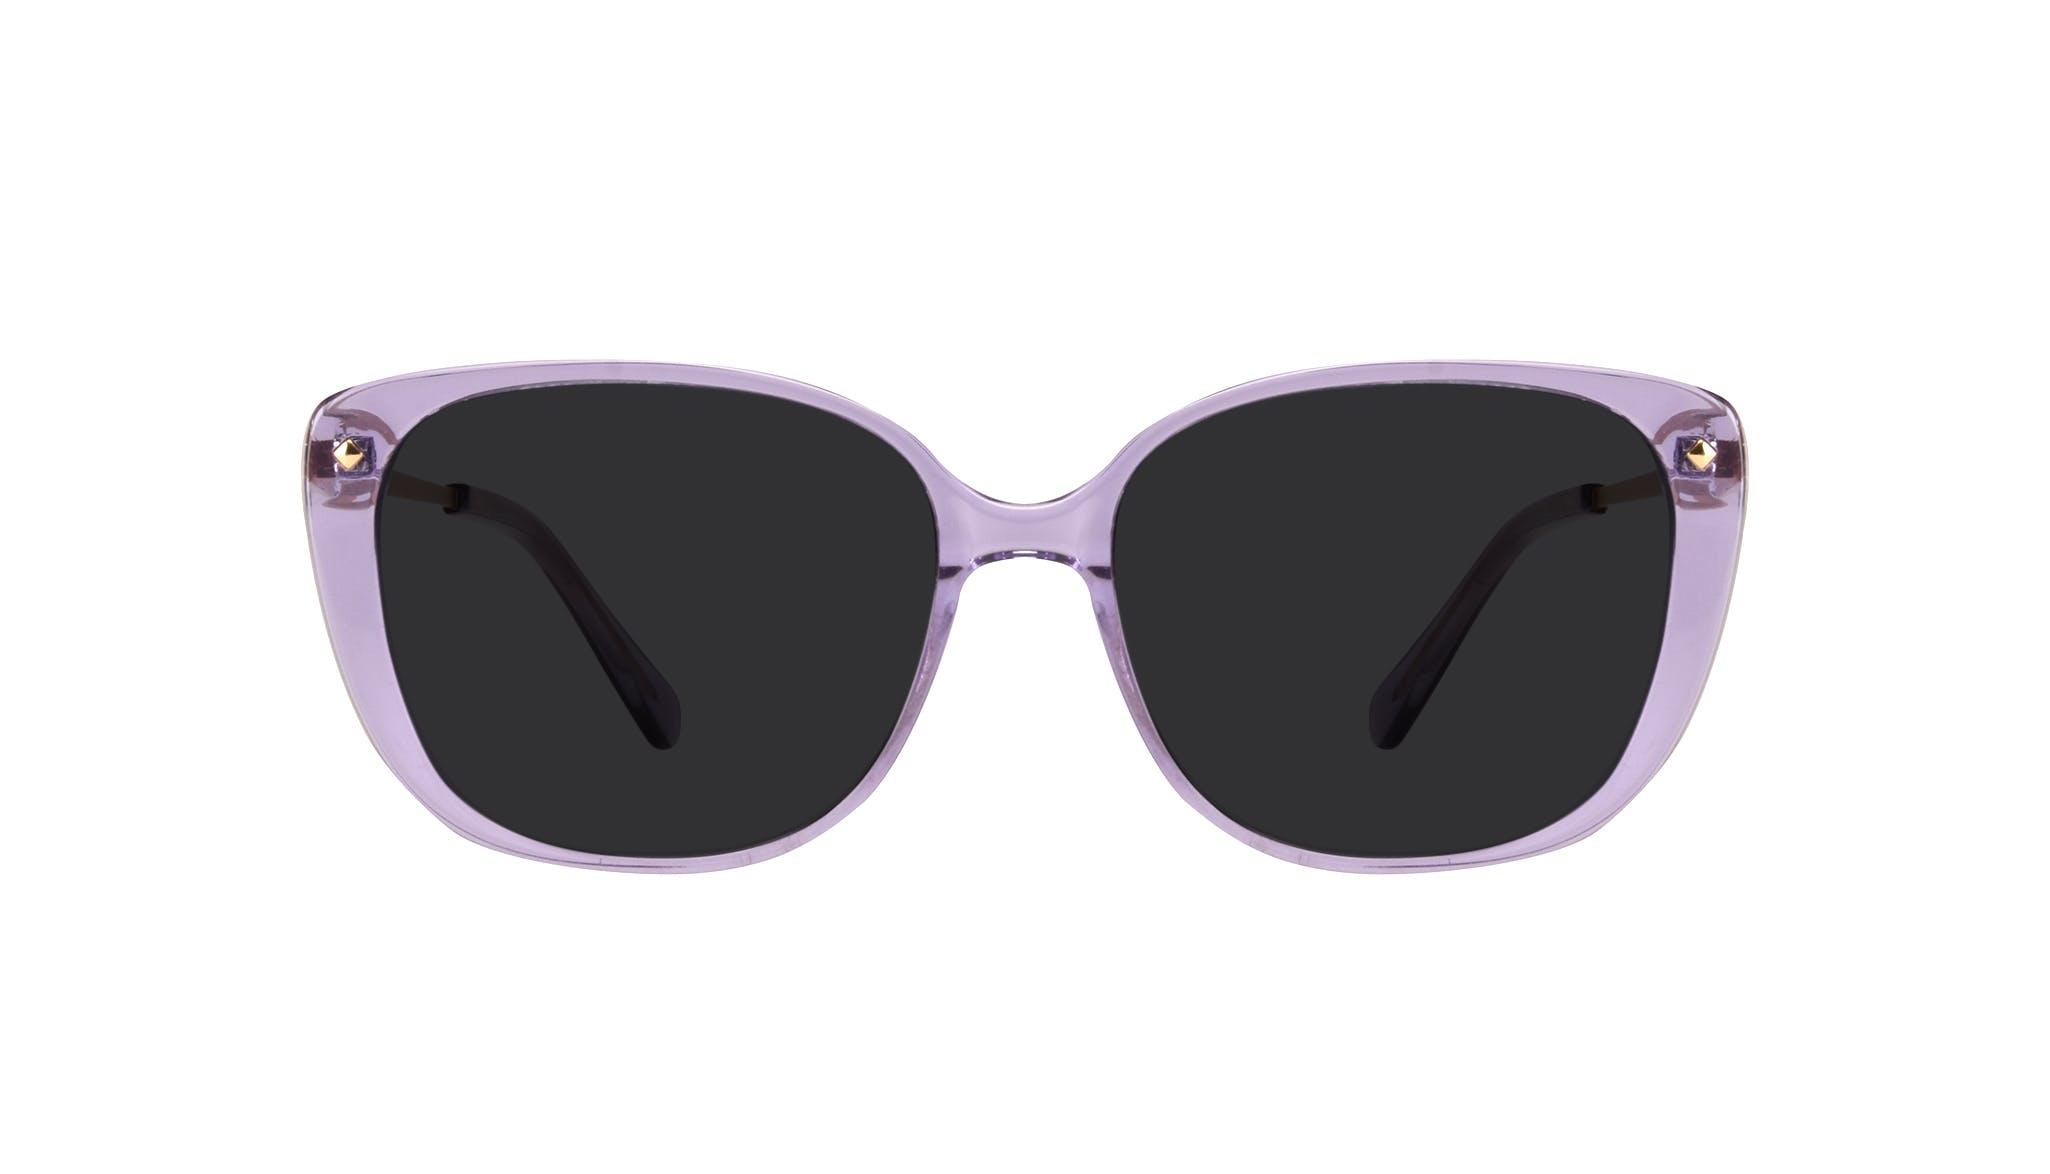 Affordable Fashion Glasses Square Sunglasses Women Japonisme Lavender Front